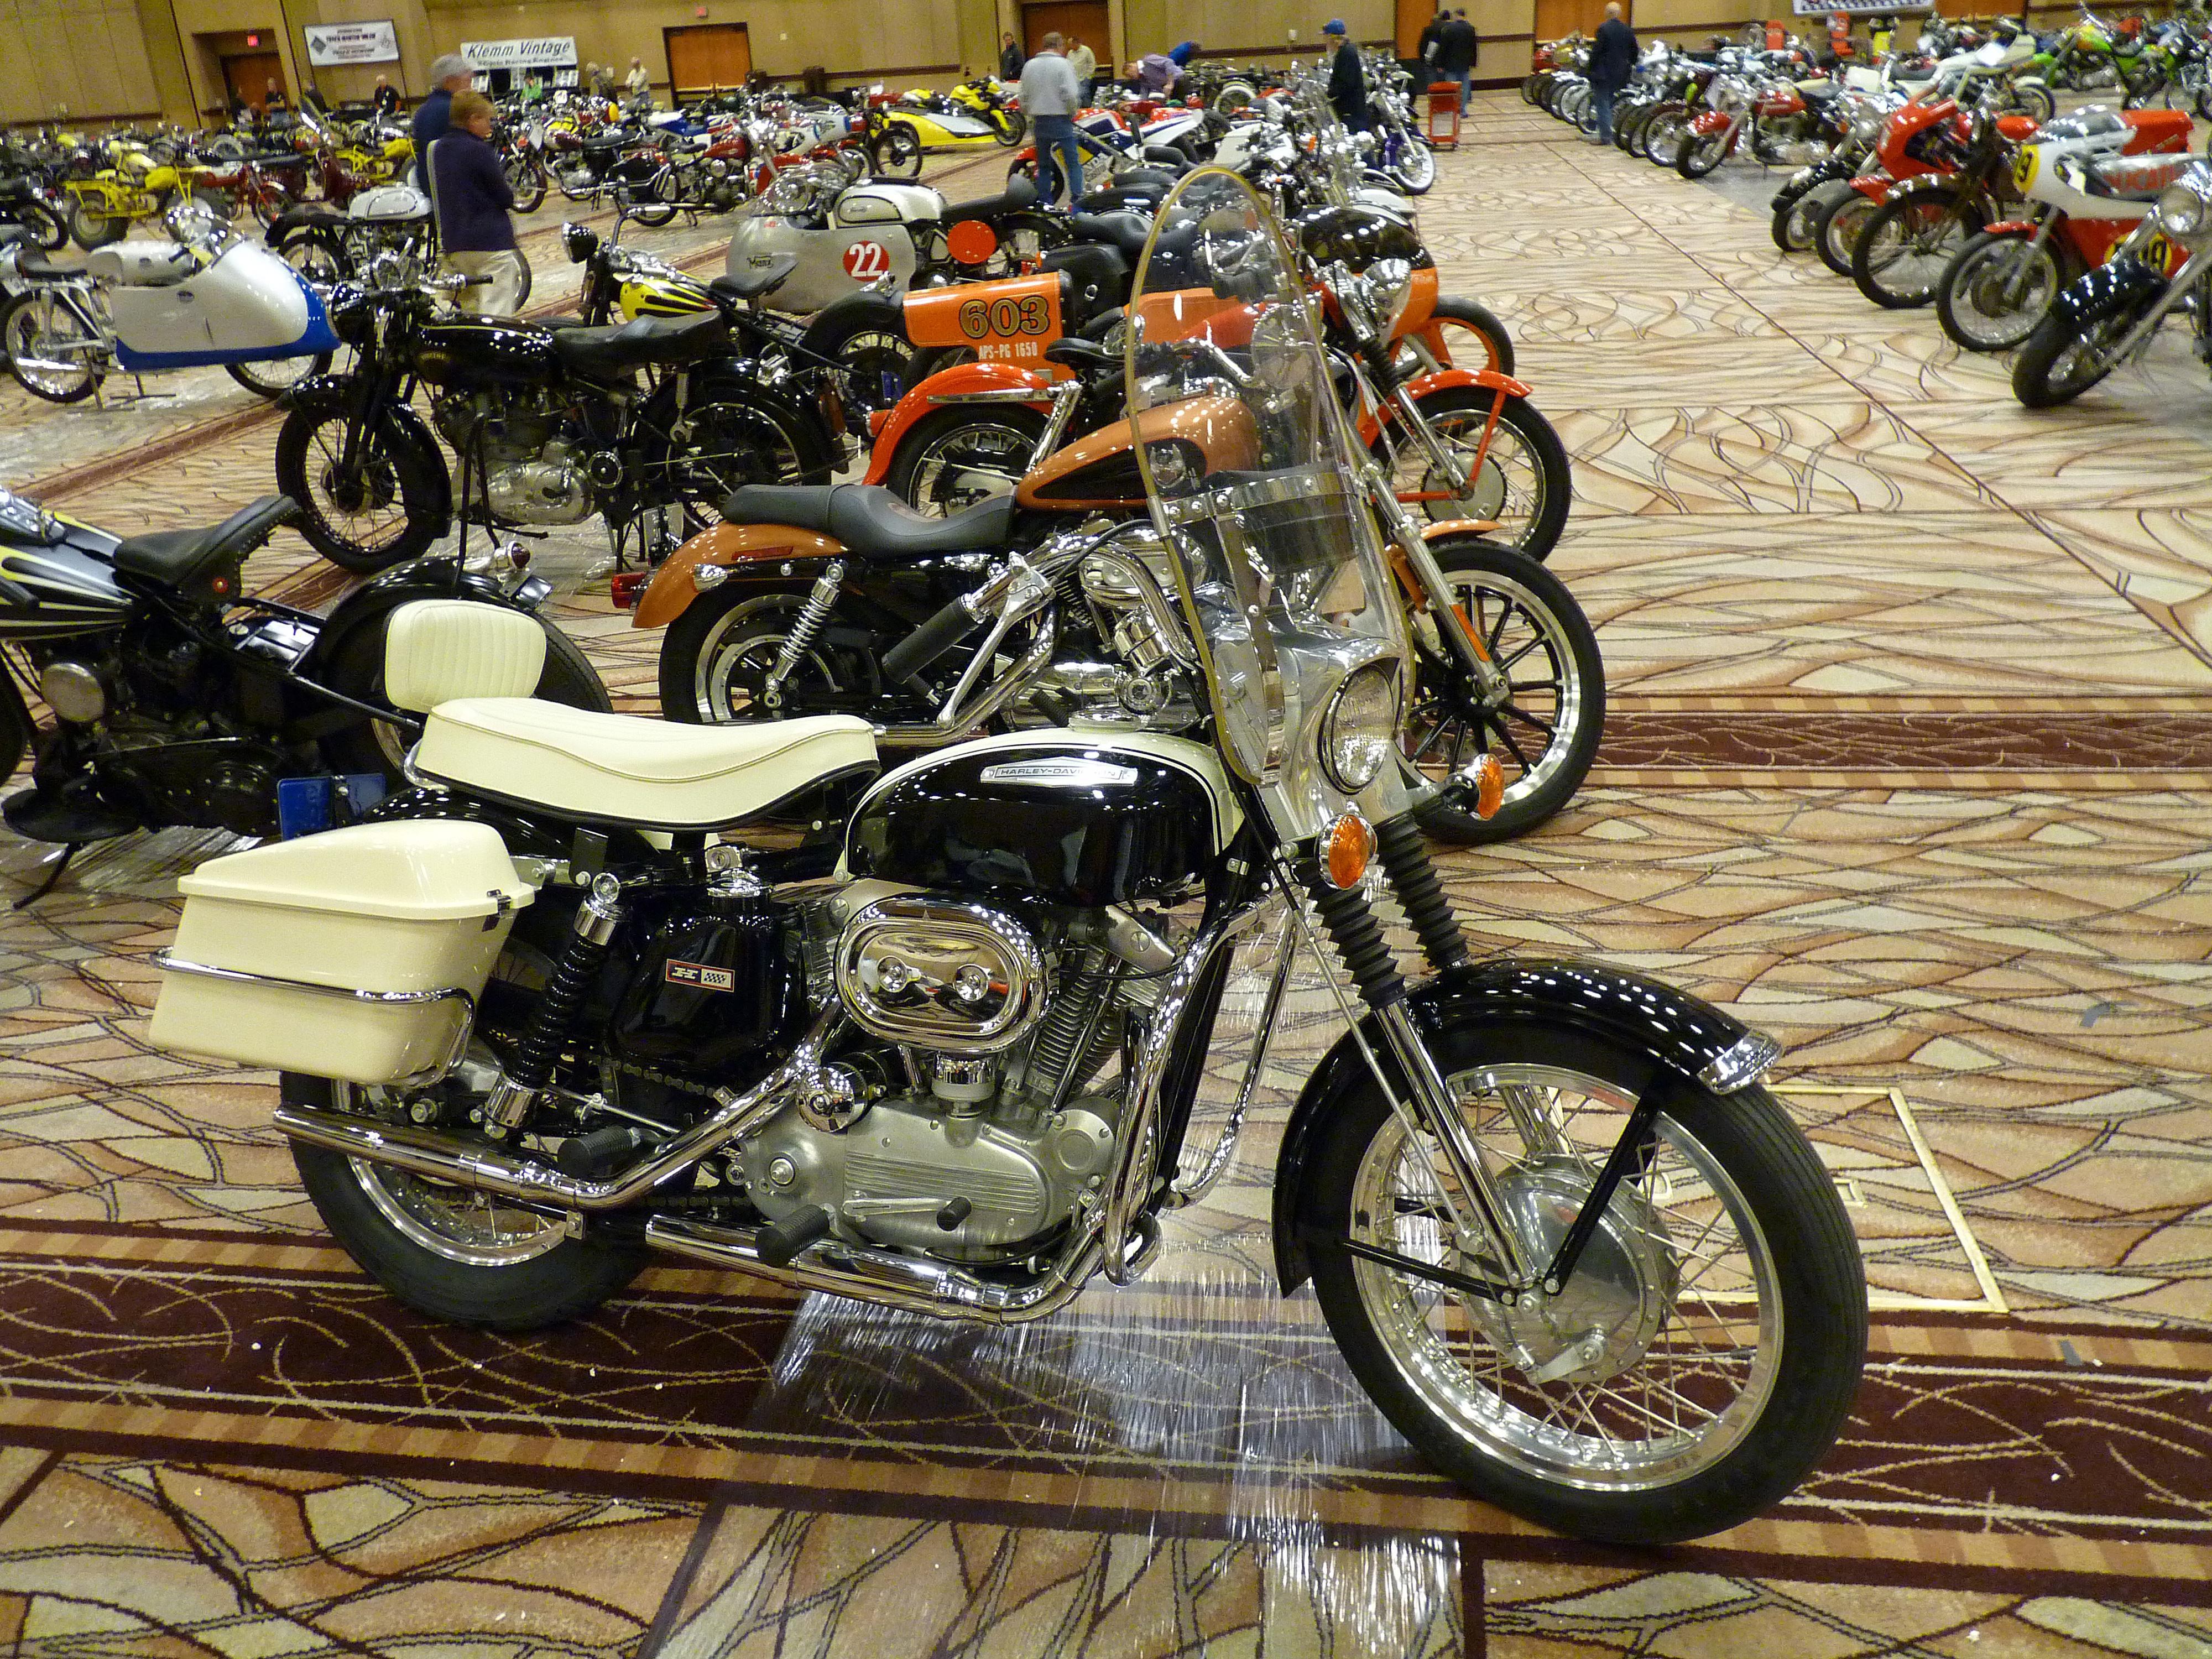 Harley Sportster on display in a showroom.